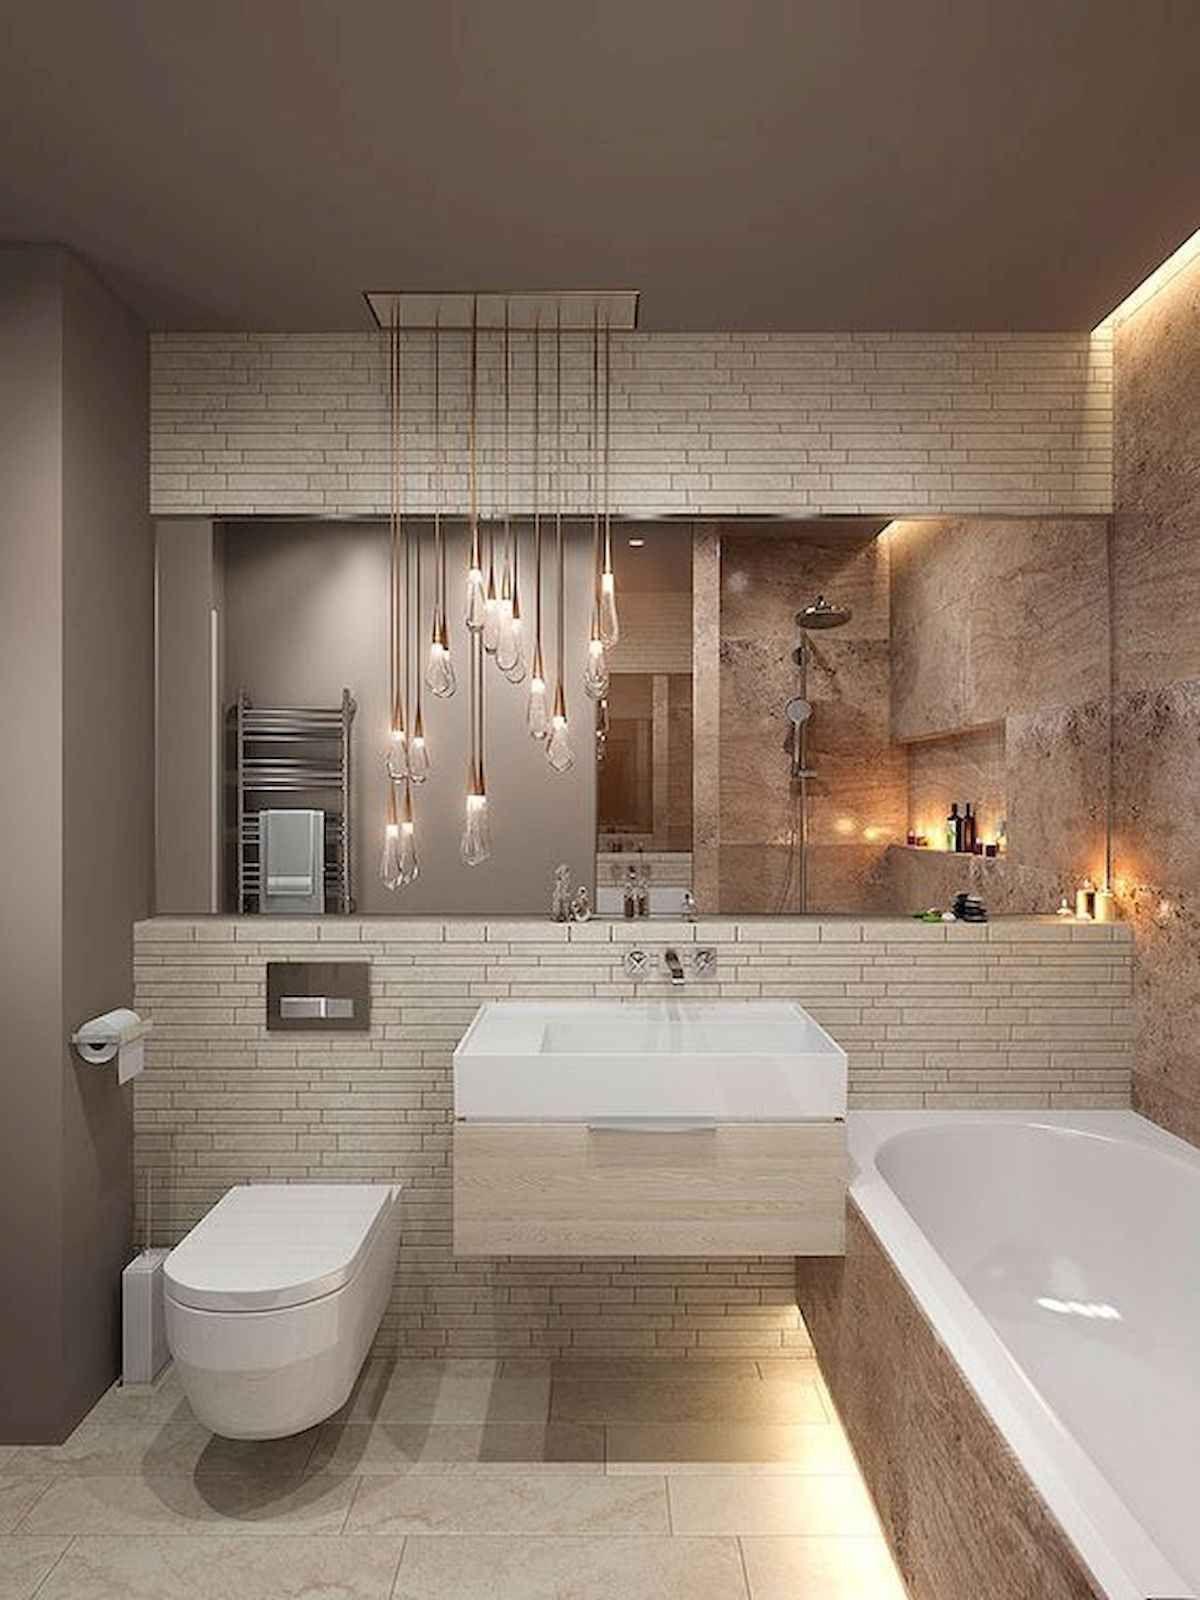 55 fresh small master bathroom remodel ideas and design on bathroom renovation ideas australia id=30454